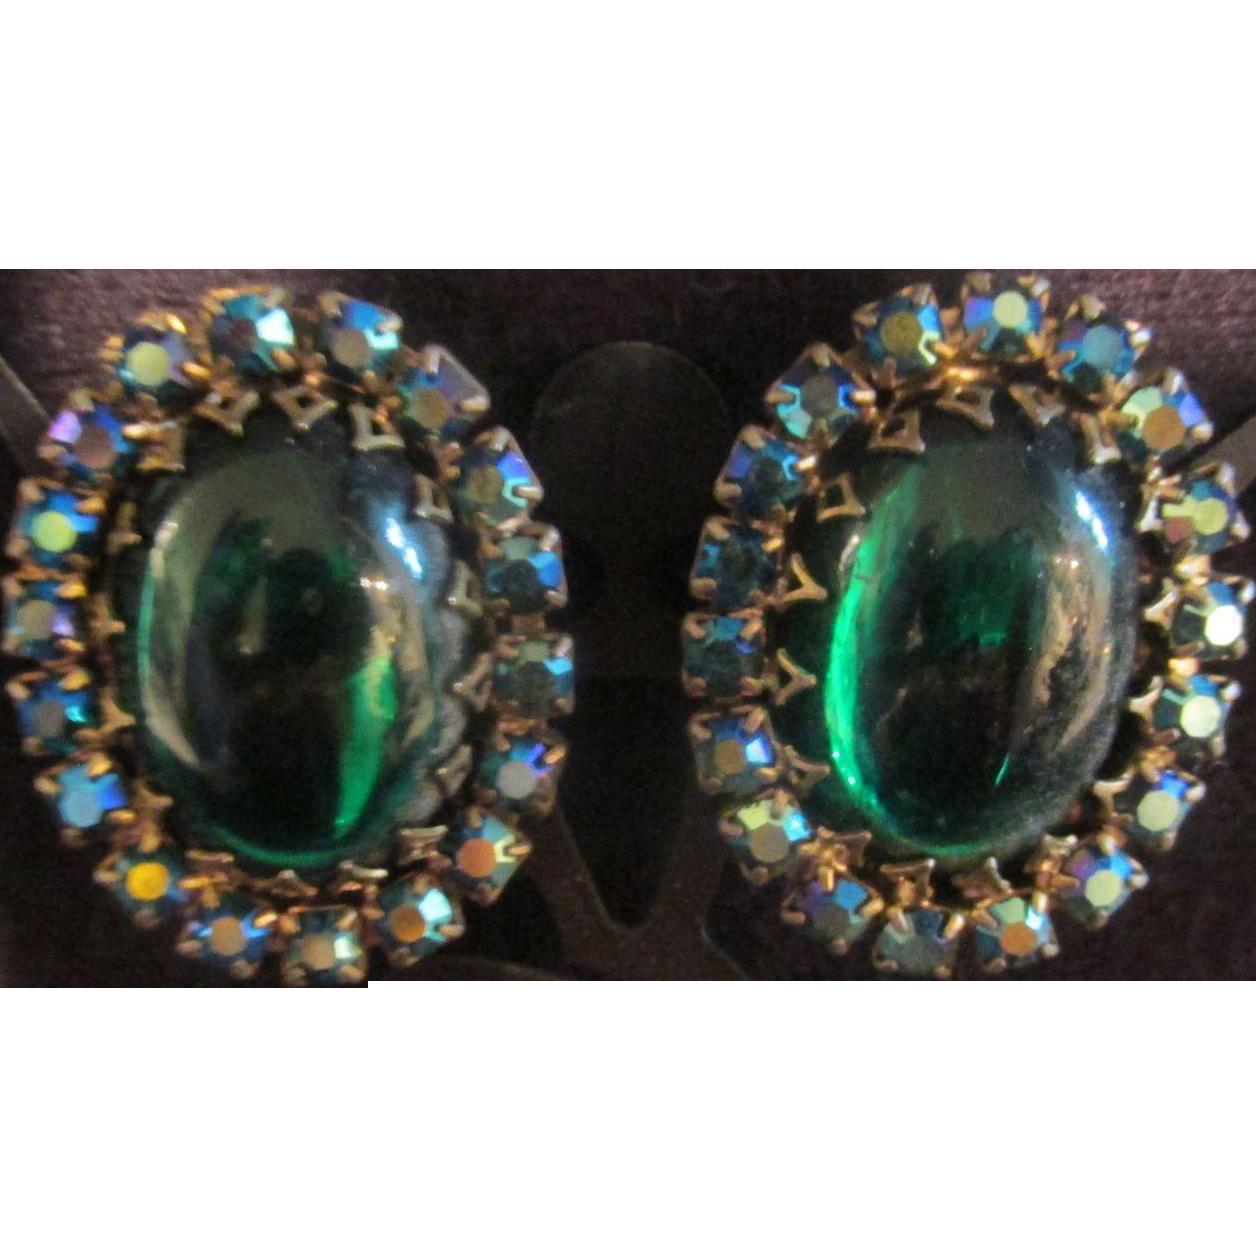 Emerald Green Vintage Earrings many Stones